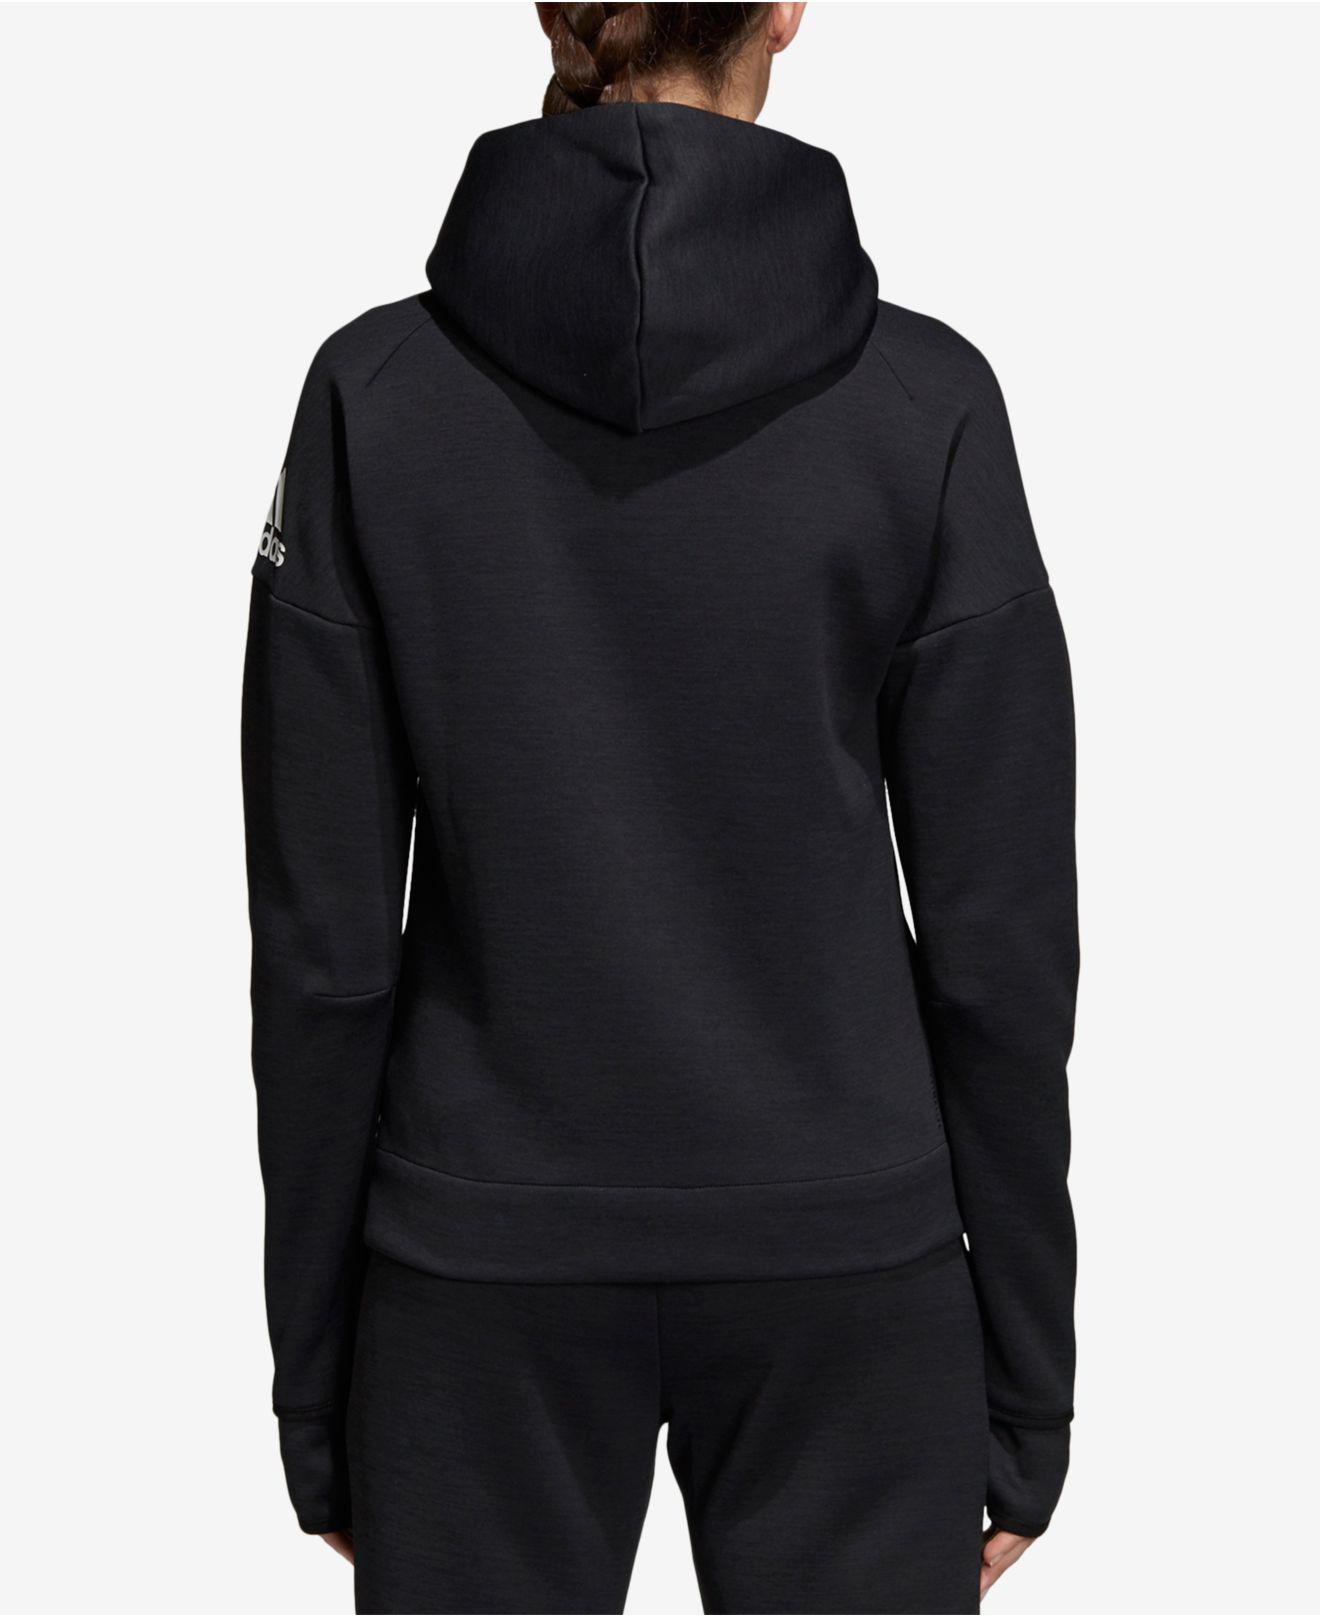 0302961a2fca Lyst - adidas Z.n.e. Fast-release Zip Hoodie in Black - Save 41%